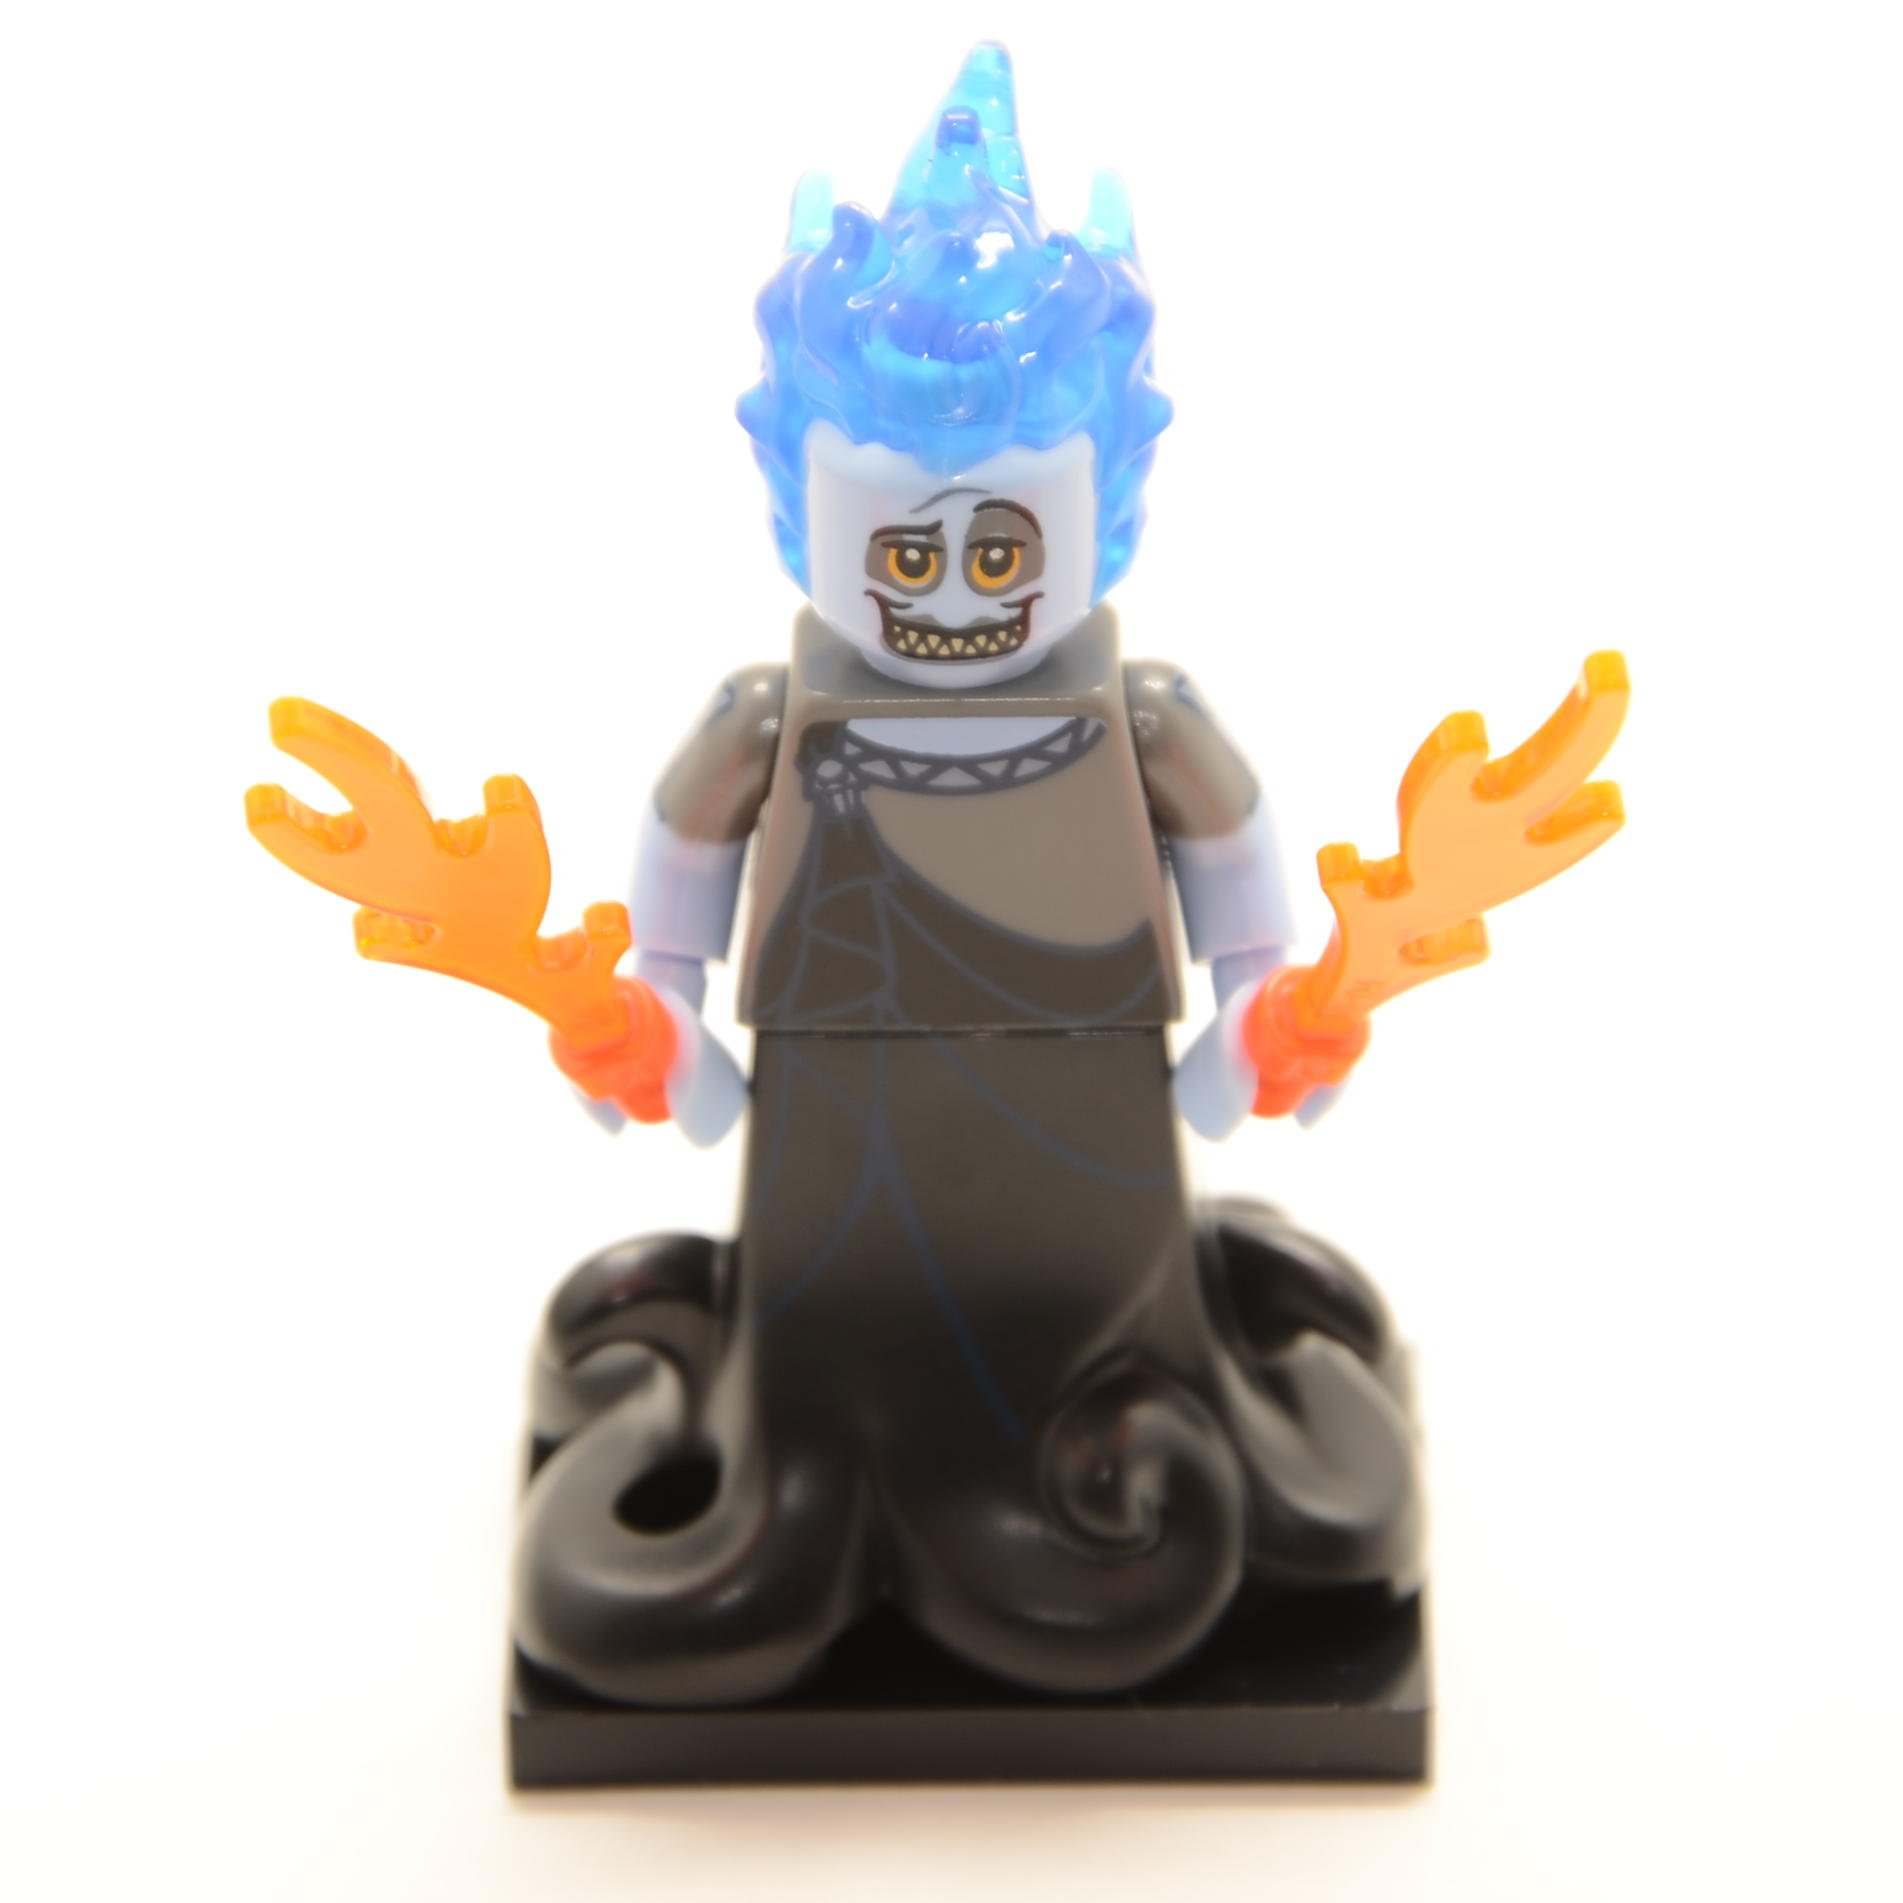 LEGO-minifigures-the-disney-series-2-hercules-hades